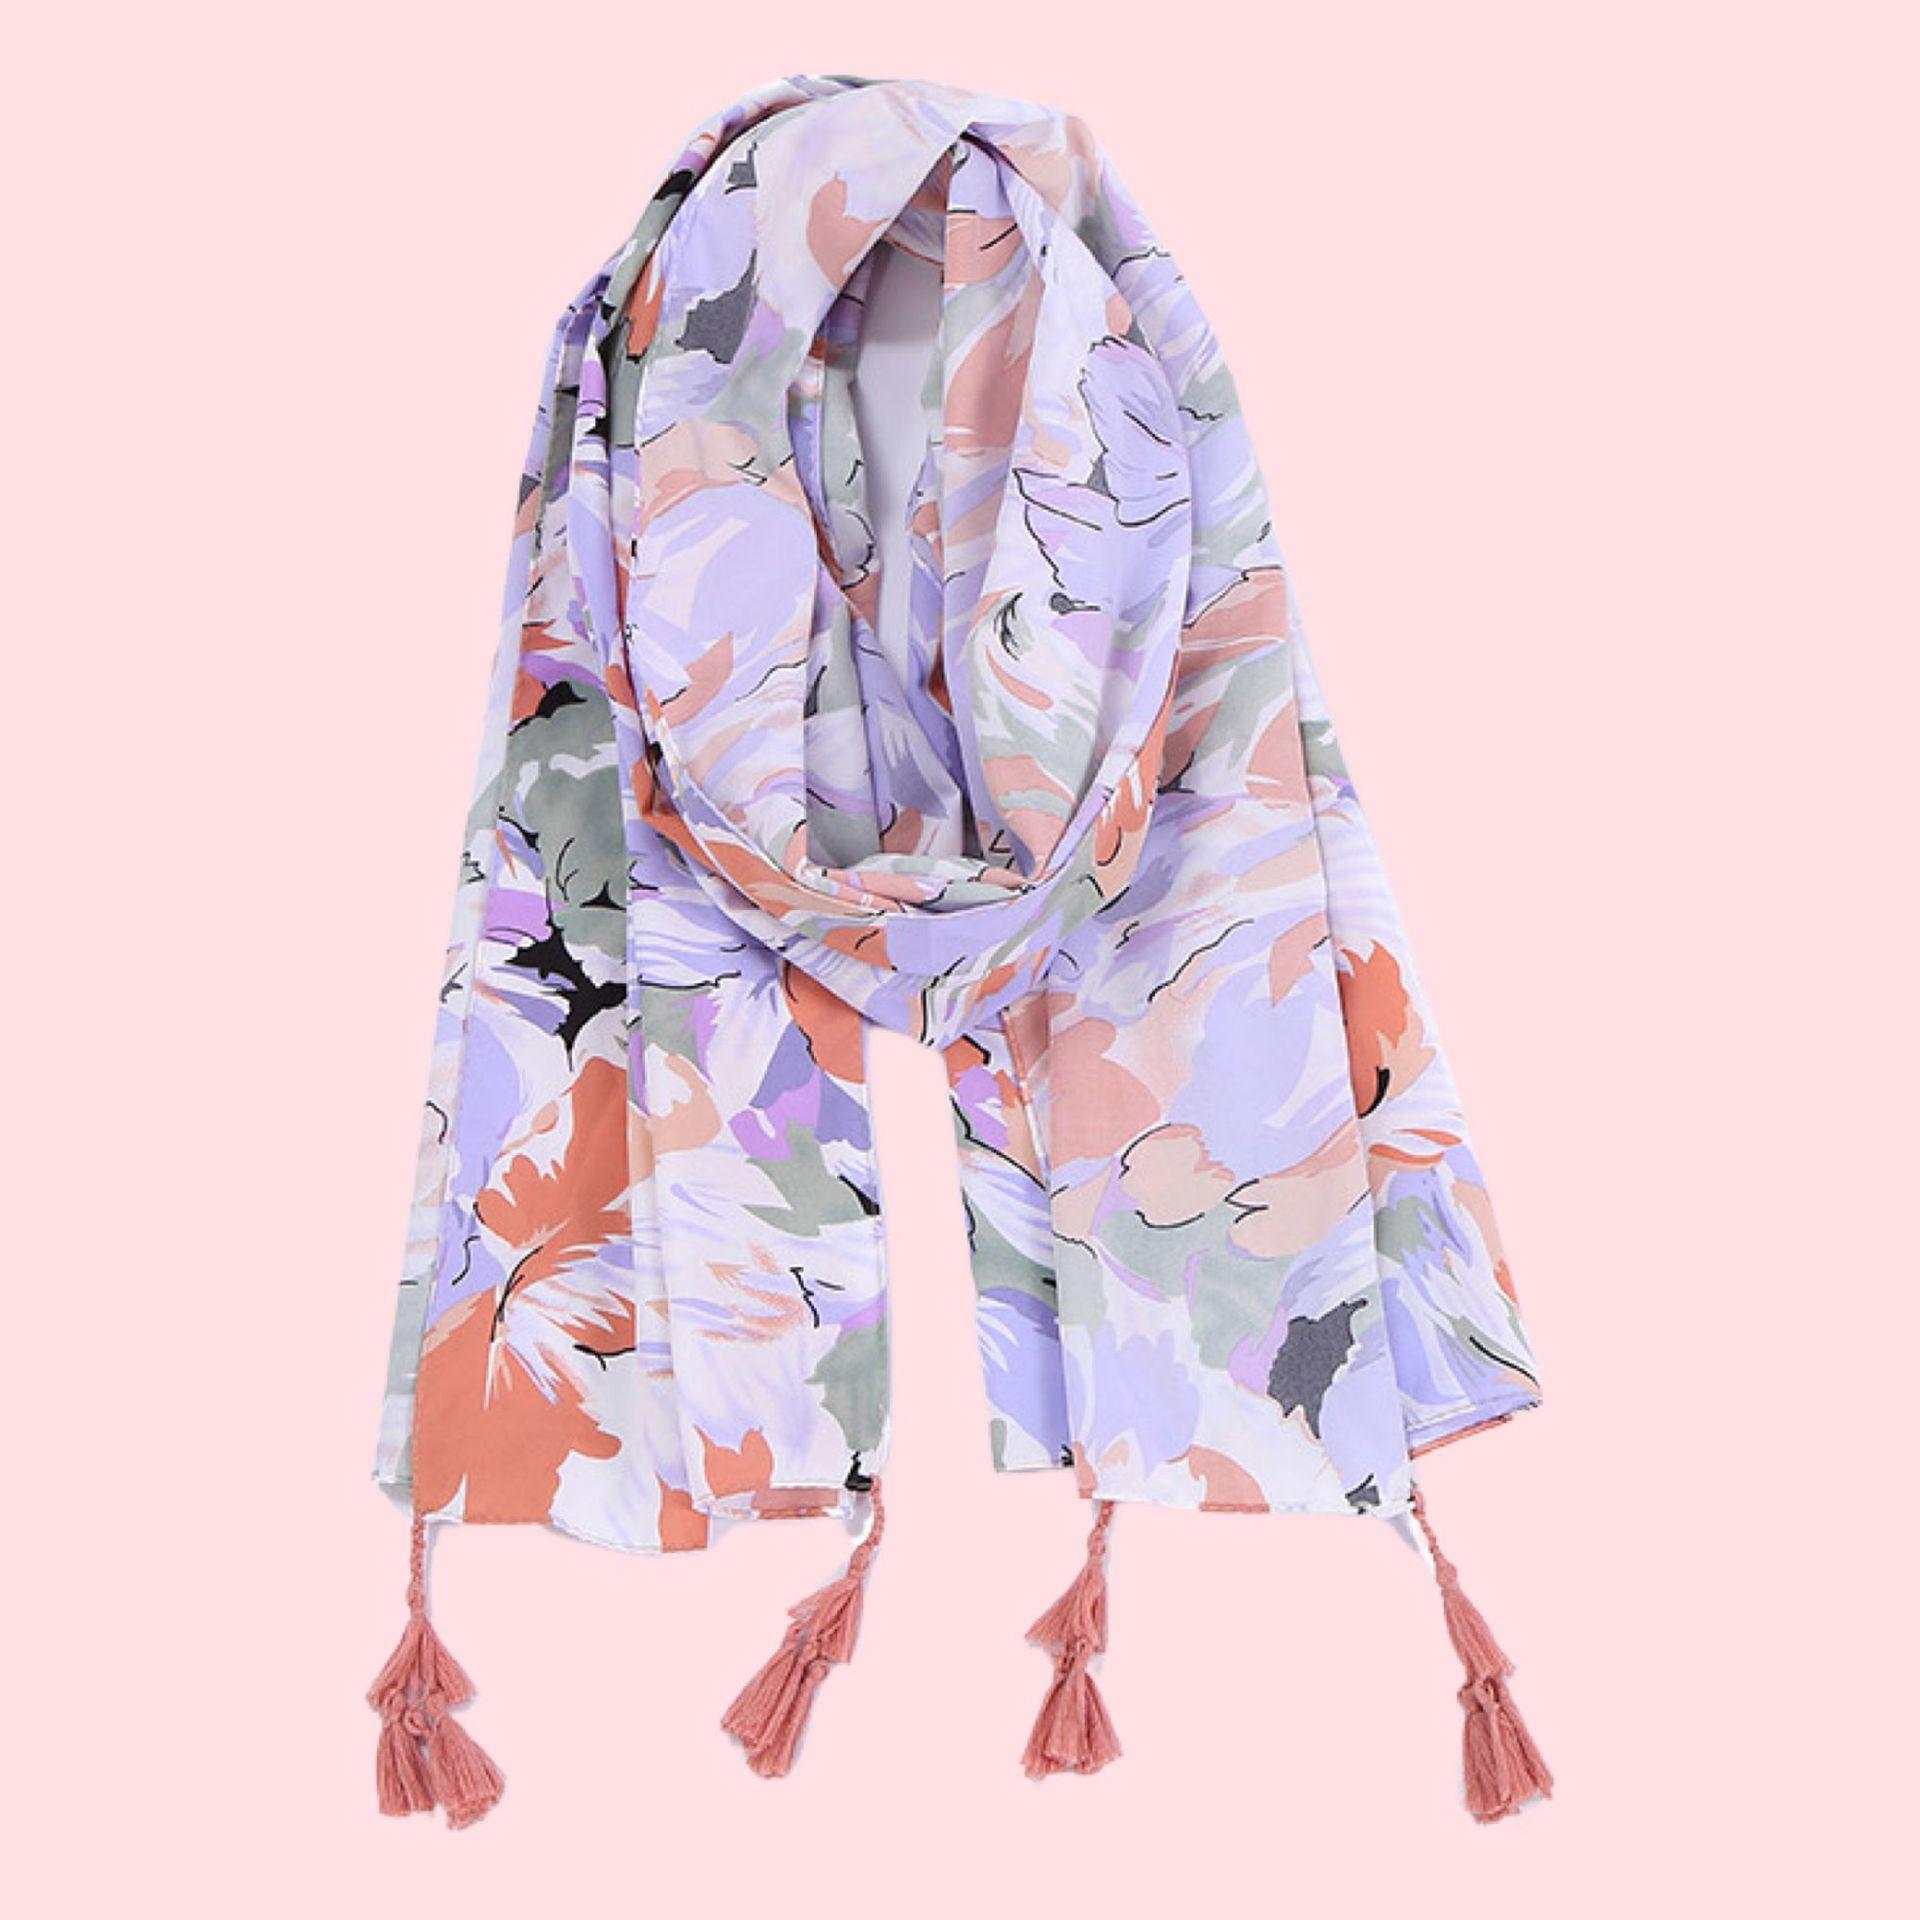 Vibrant and Stylish Scarf for Autumn Season Outdoor Fashion